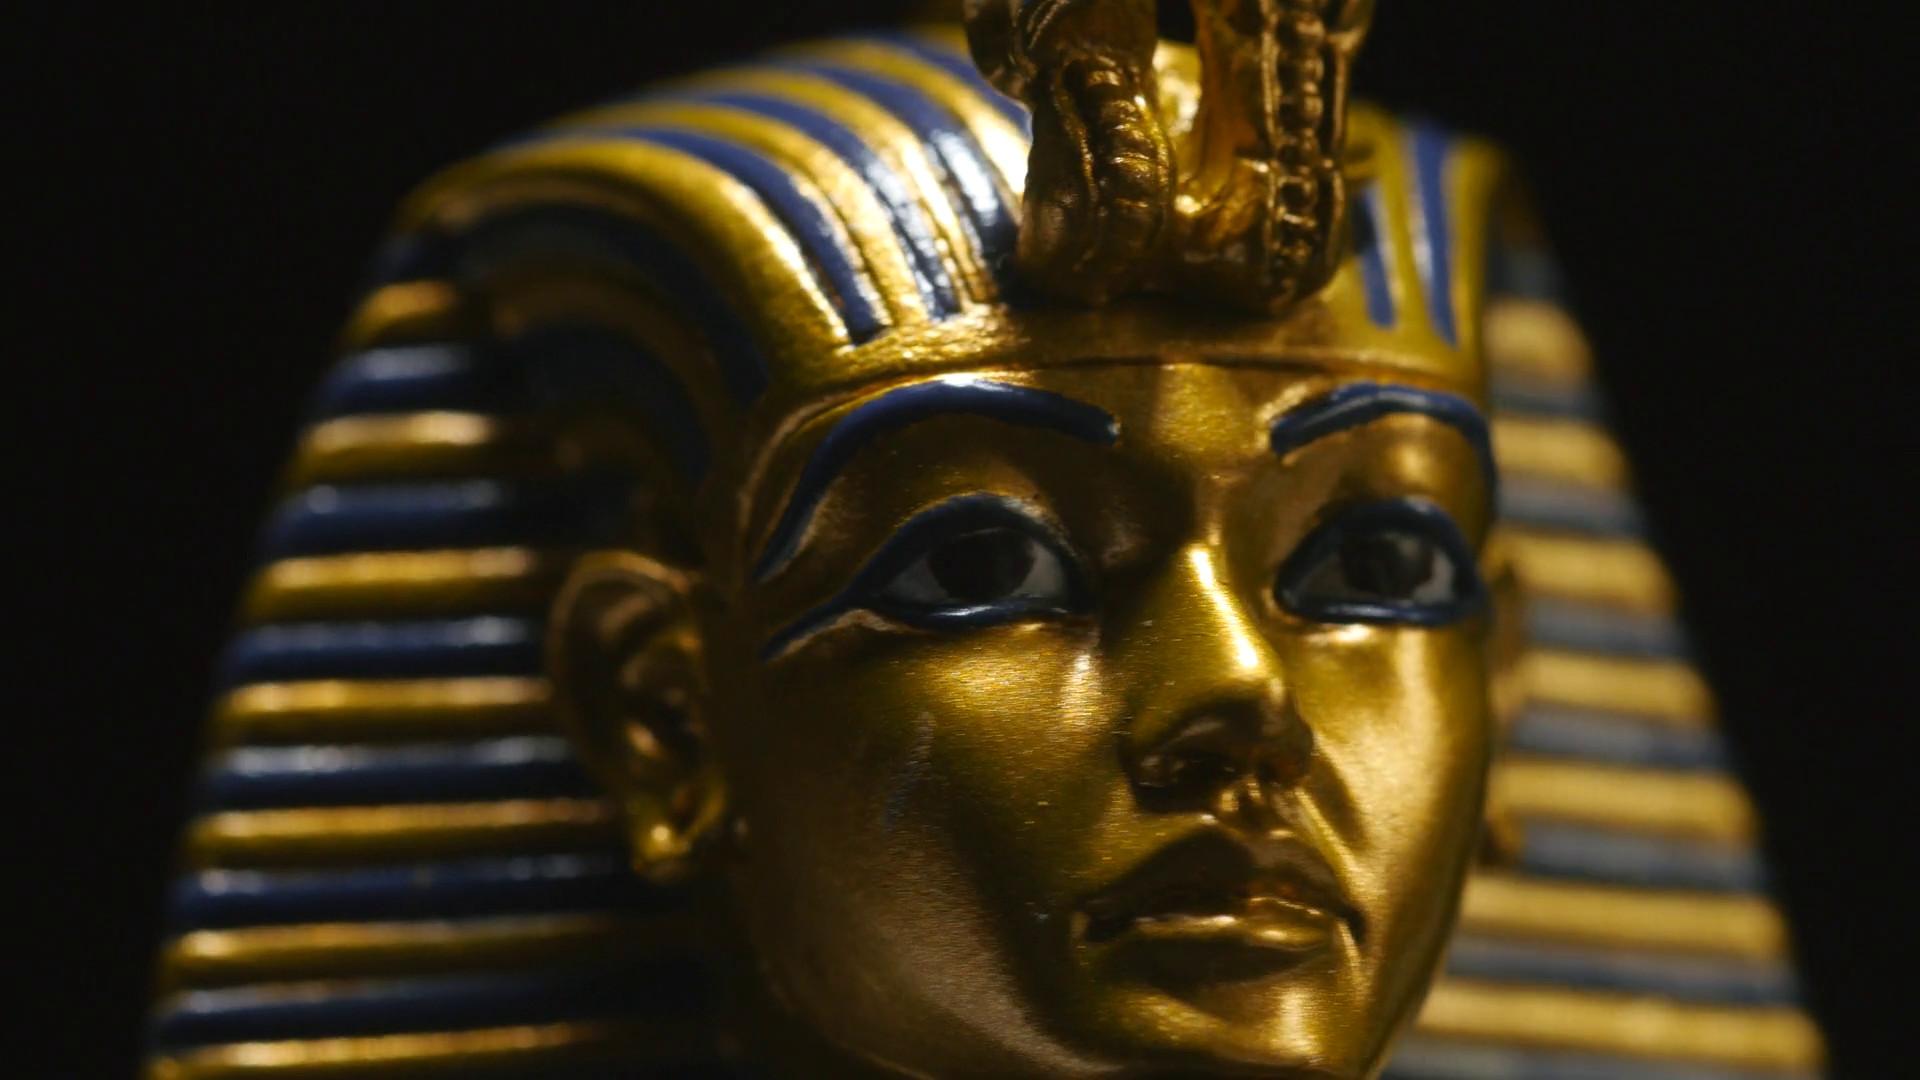 4K Closeup Pharaoh Mask Artifact – Egyptian Archaeology Stock Video Footage  – VideoBlocks